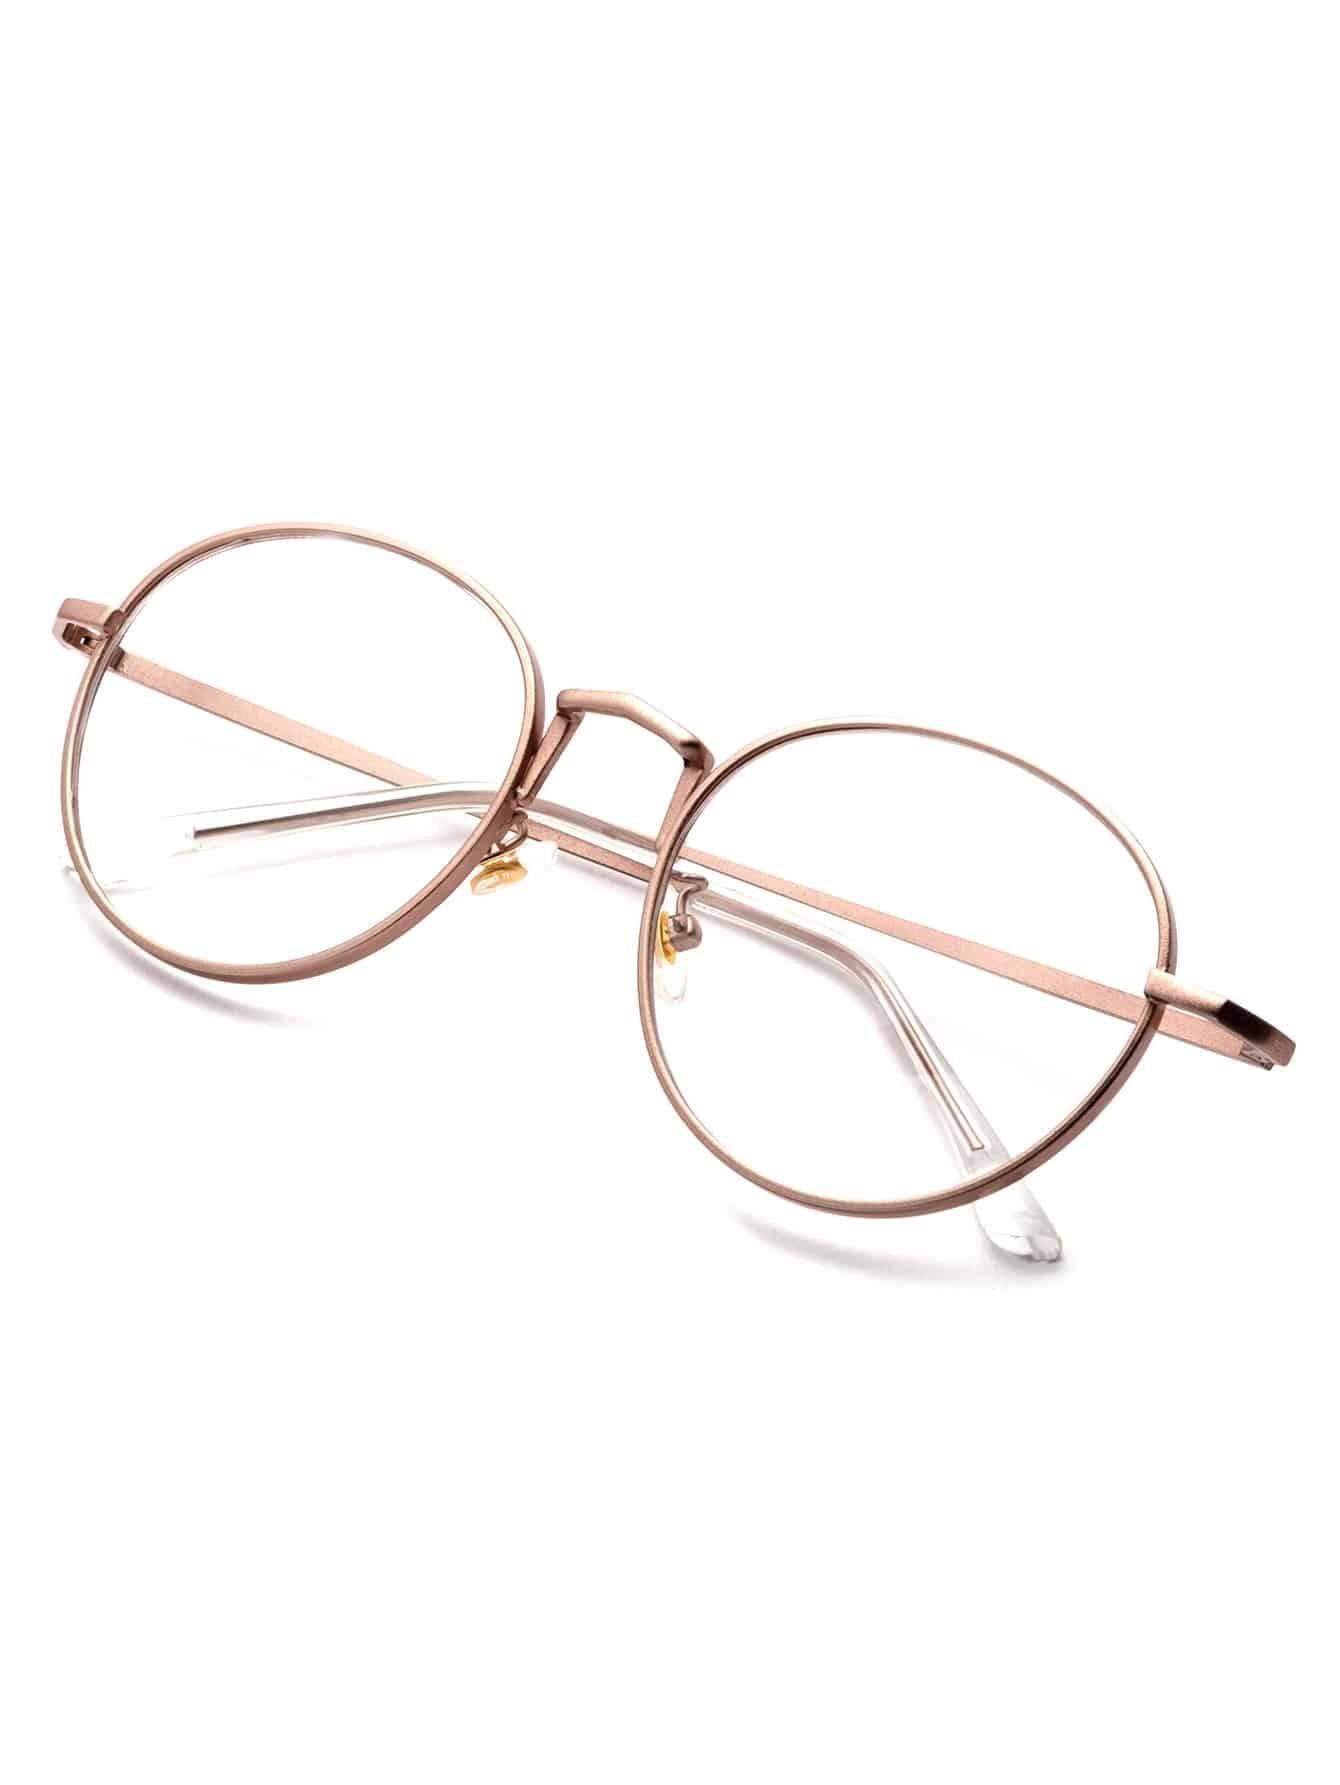 Rose Gold Delicate Frame Clear Lens GlassesFor Women-romwe